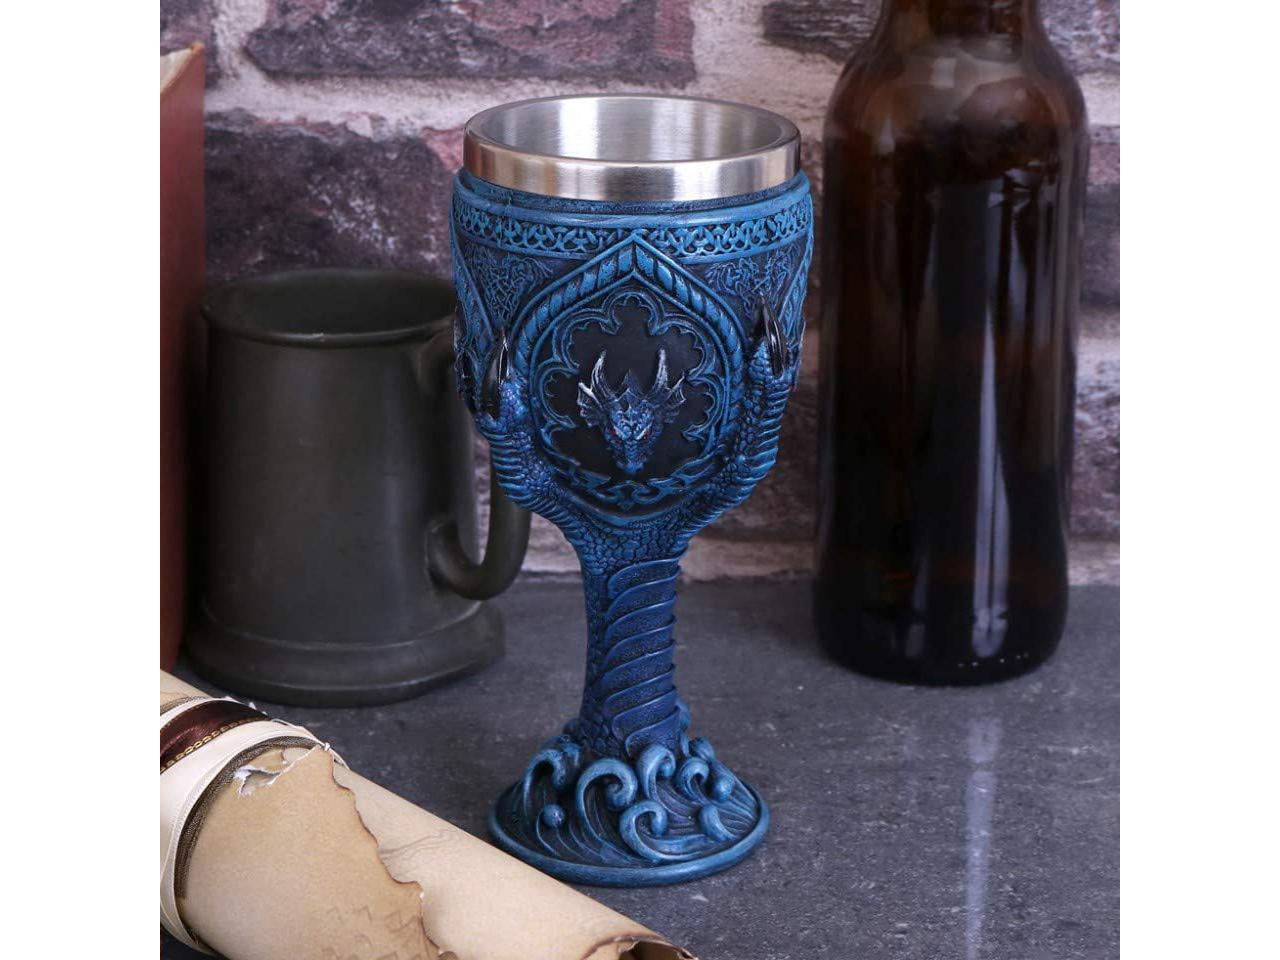 Draconic Grasp Goblet Dragon Celtic Drinkware Kitchen Chalice Wine Nemesis Now